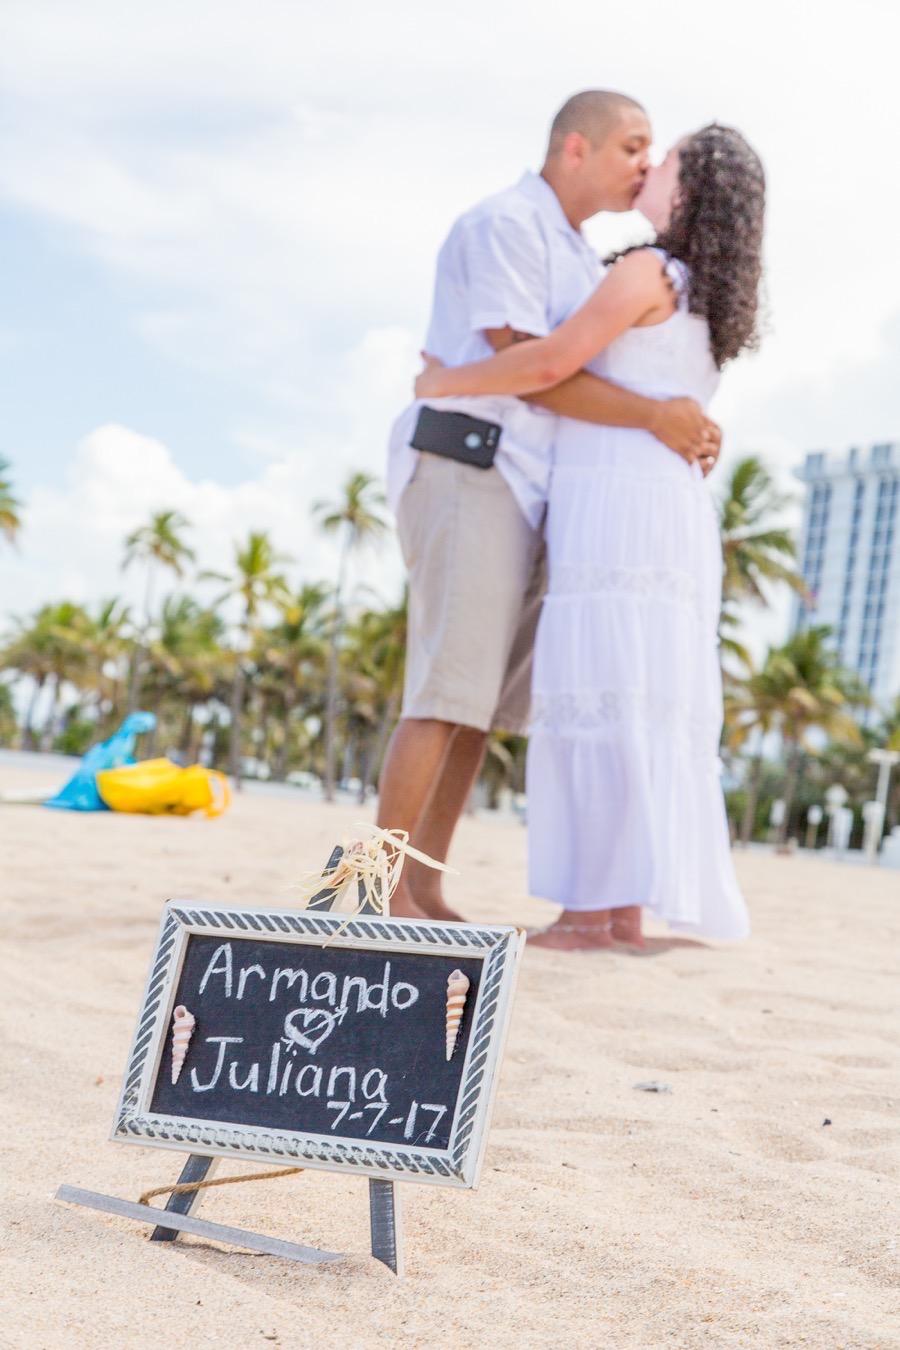 7-7-17 Armando & Juliana_69